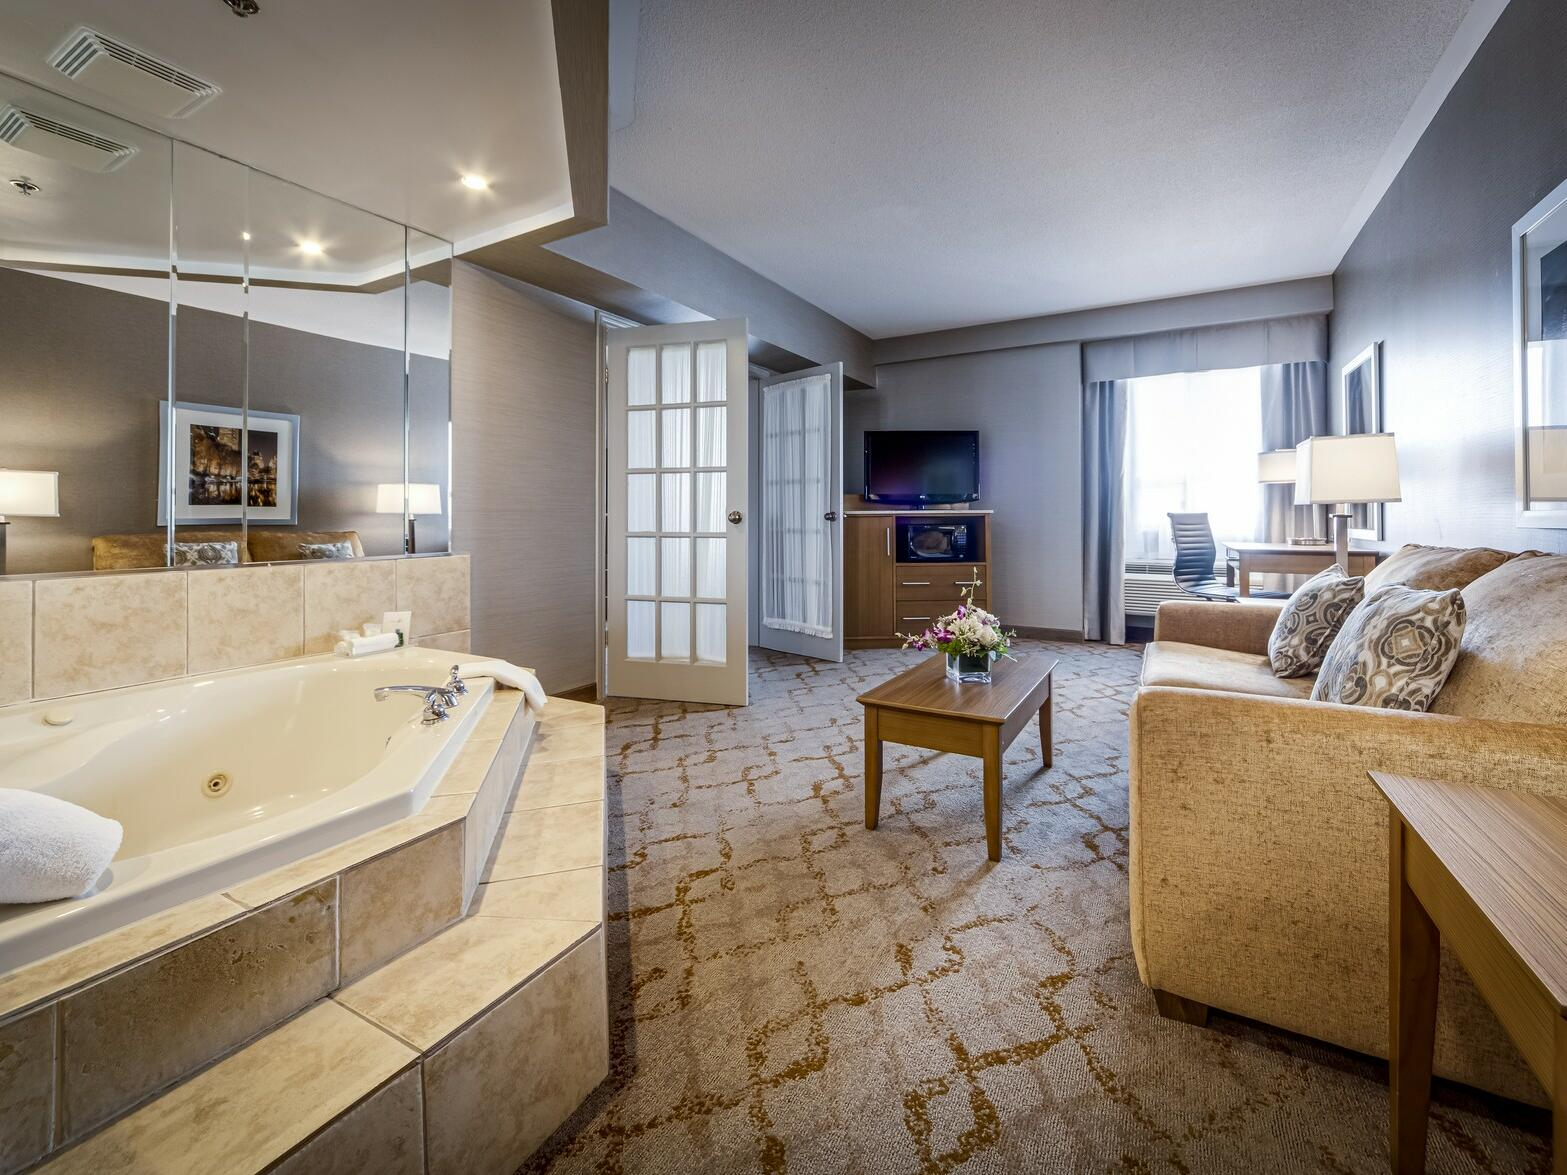 Deluxe King Jacuzzi Suite living room at Monte Carlo Inn Vaughan Suites